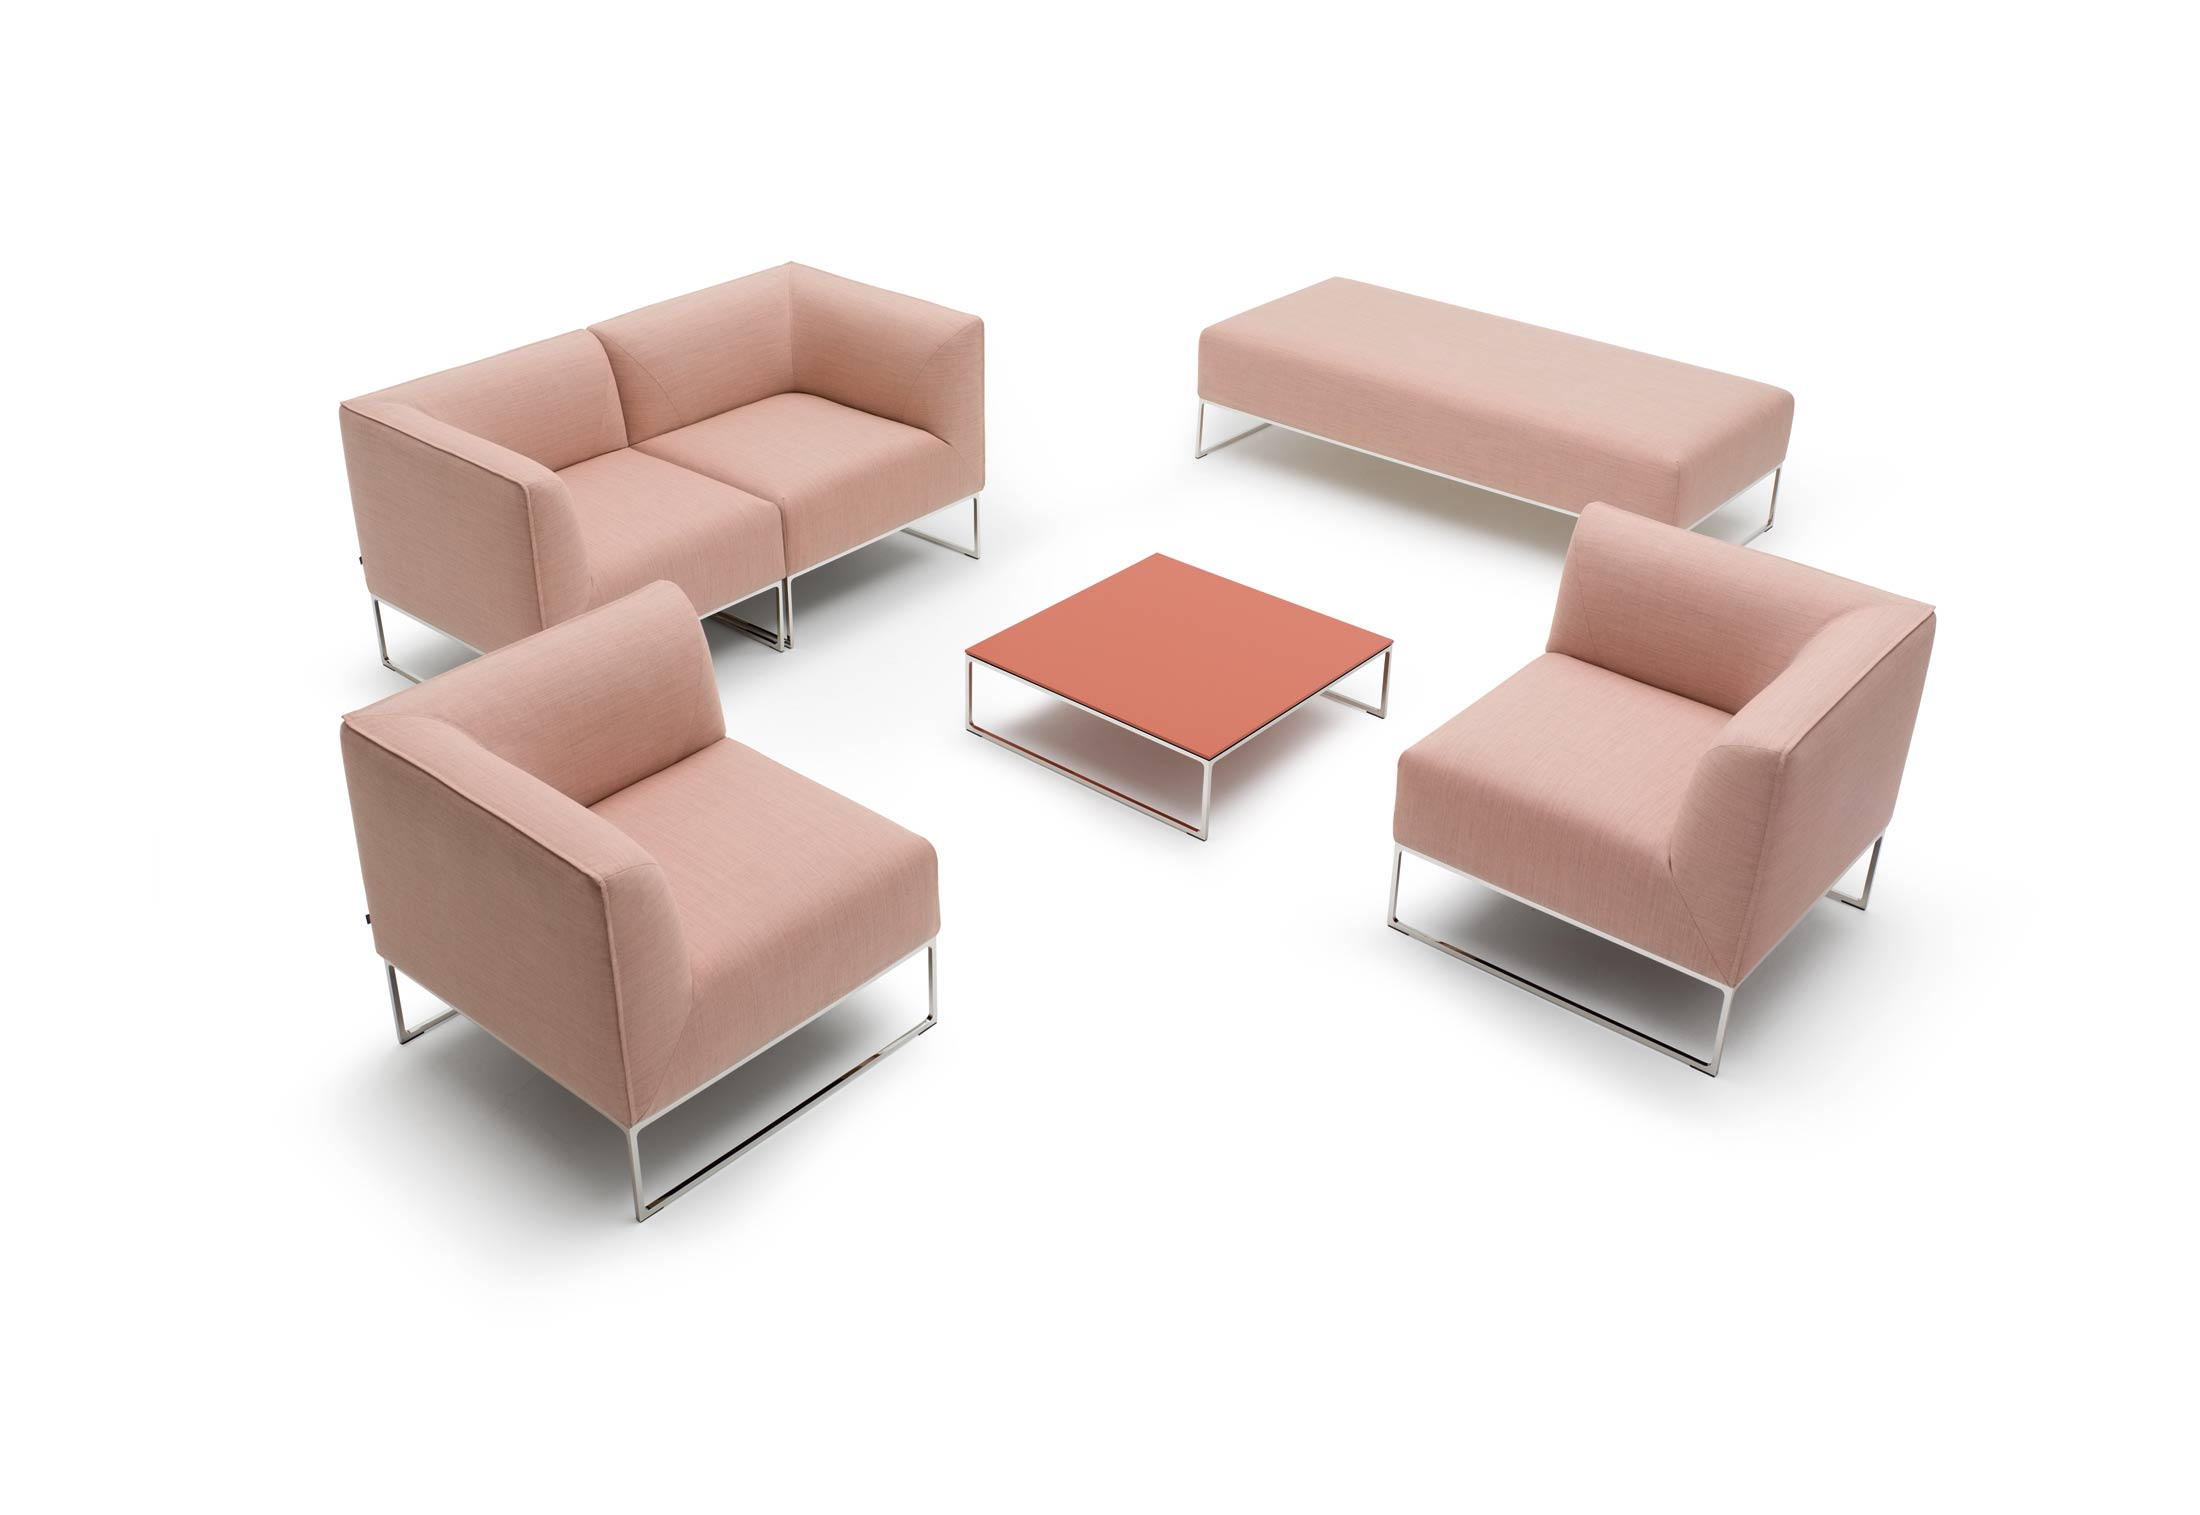 Mell corner armchair by COR | STYLEPARK